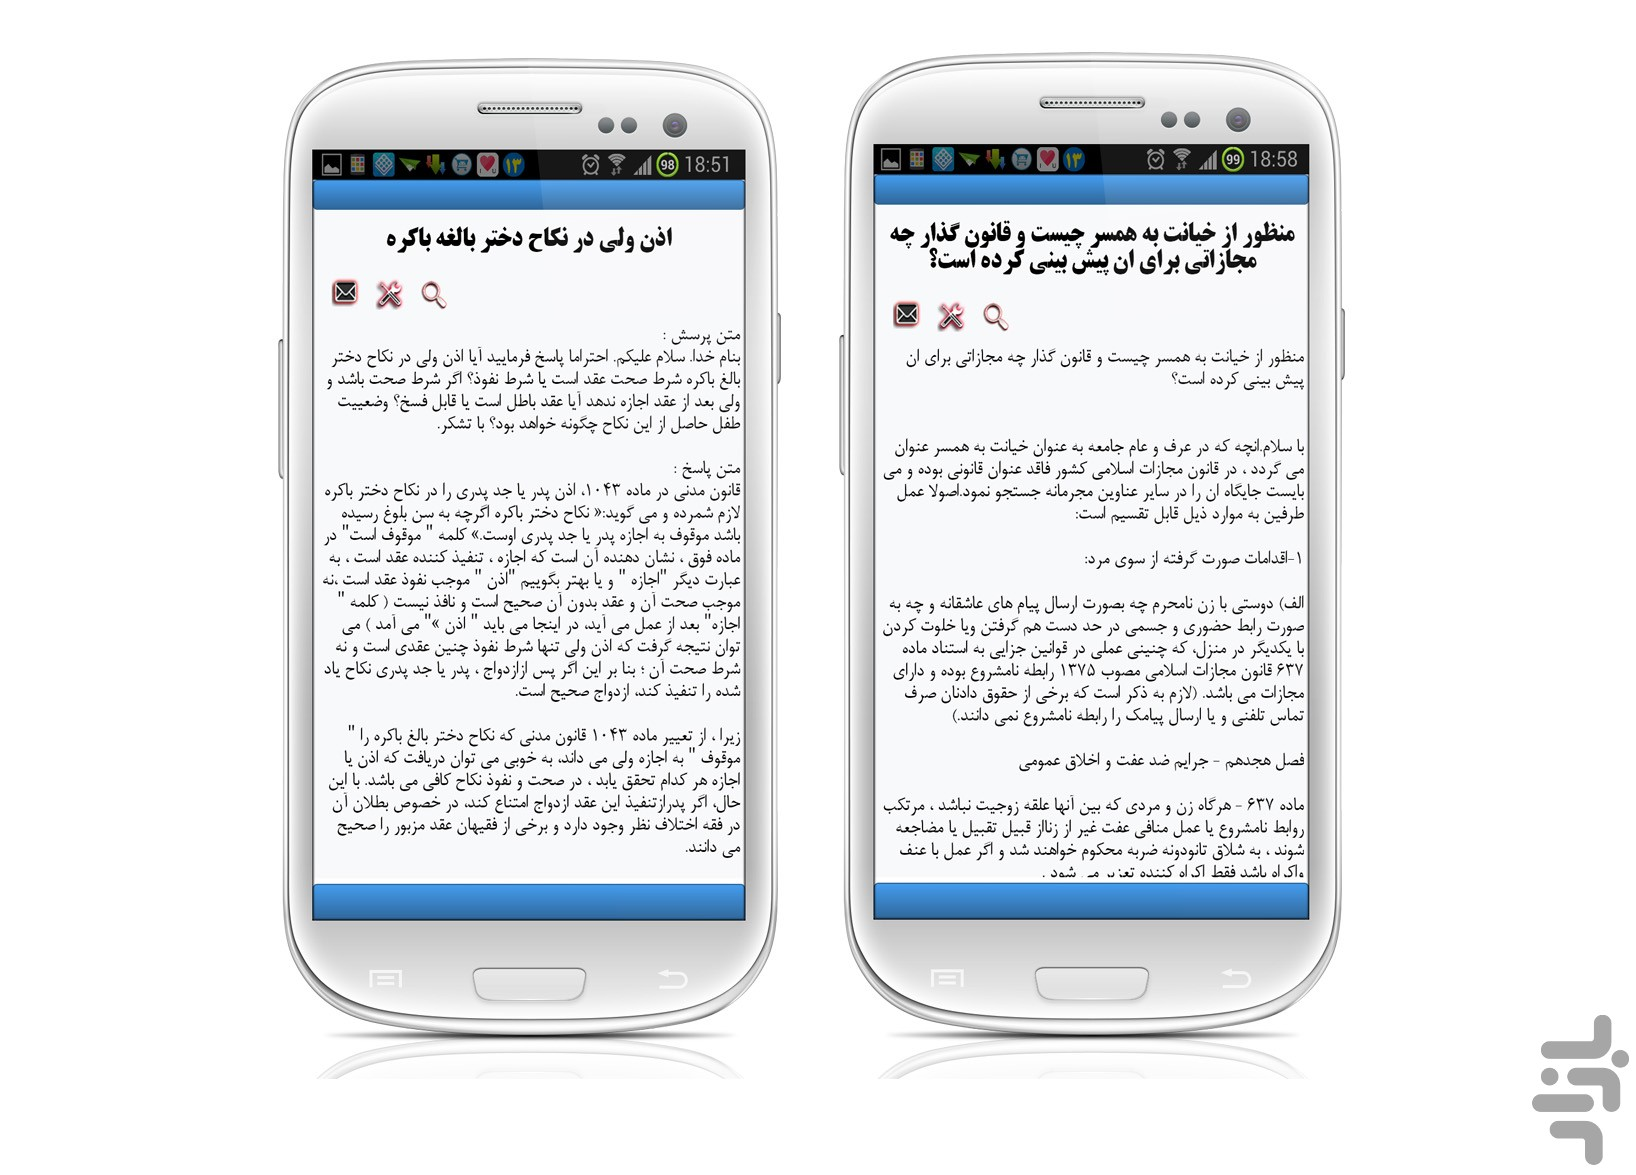 http://s.cafebazaar.ir/1/upload/screenshot/ir.Ghazi.parsababaei2.jpg